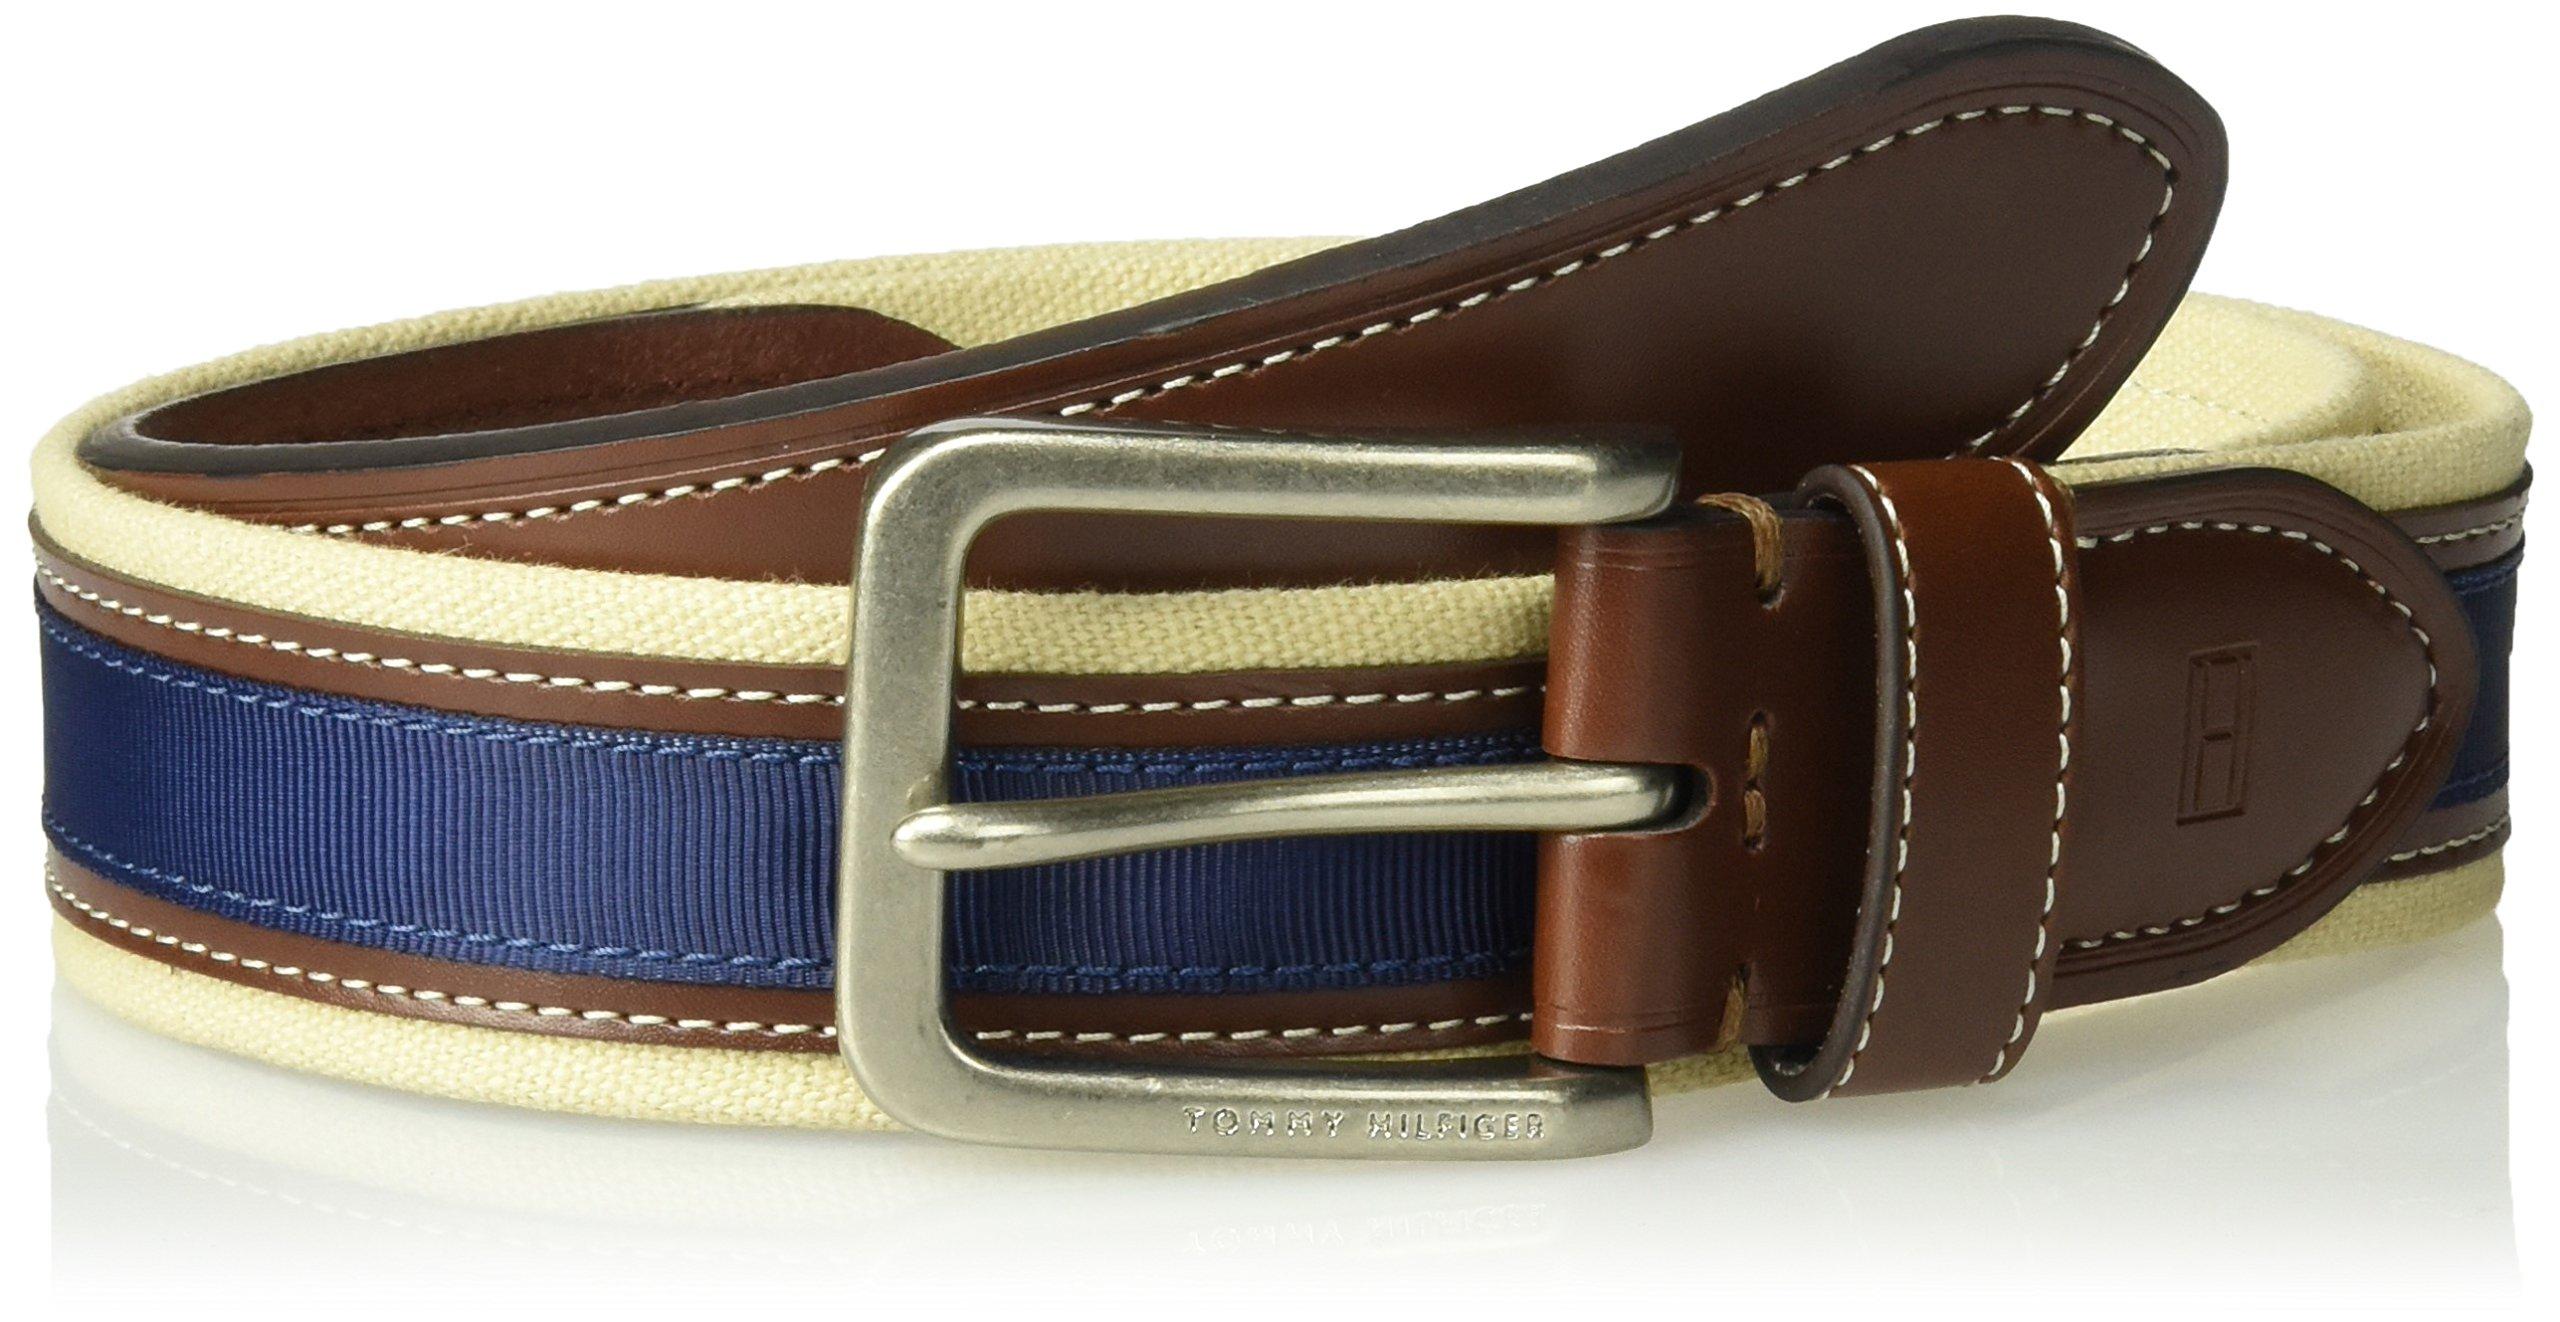 Tommy Hilfiger Men's Casual Fabric Belt, Khaki/Brown/Navy, 36